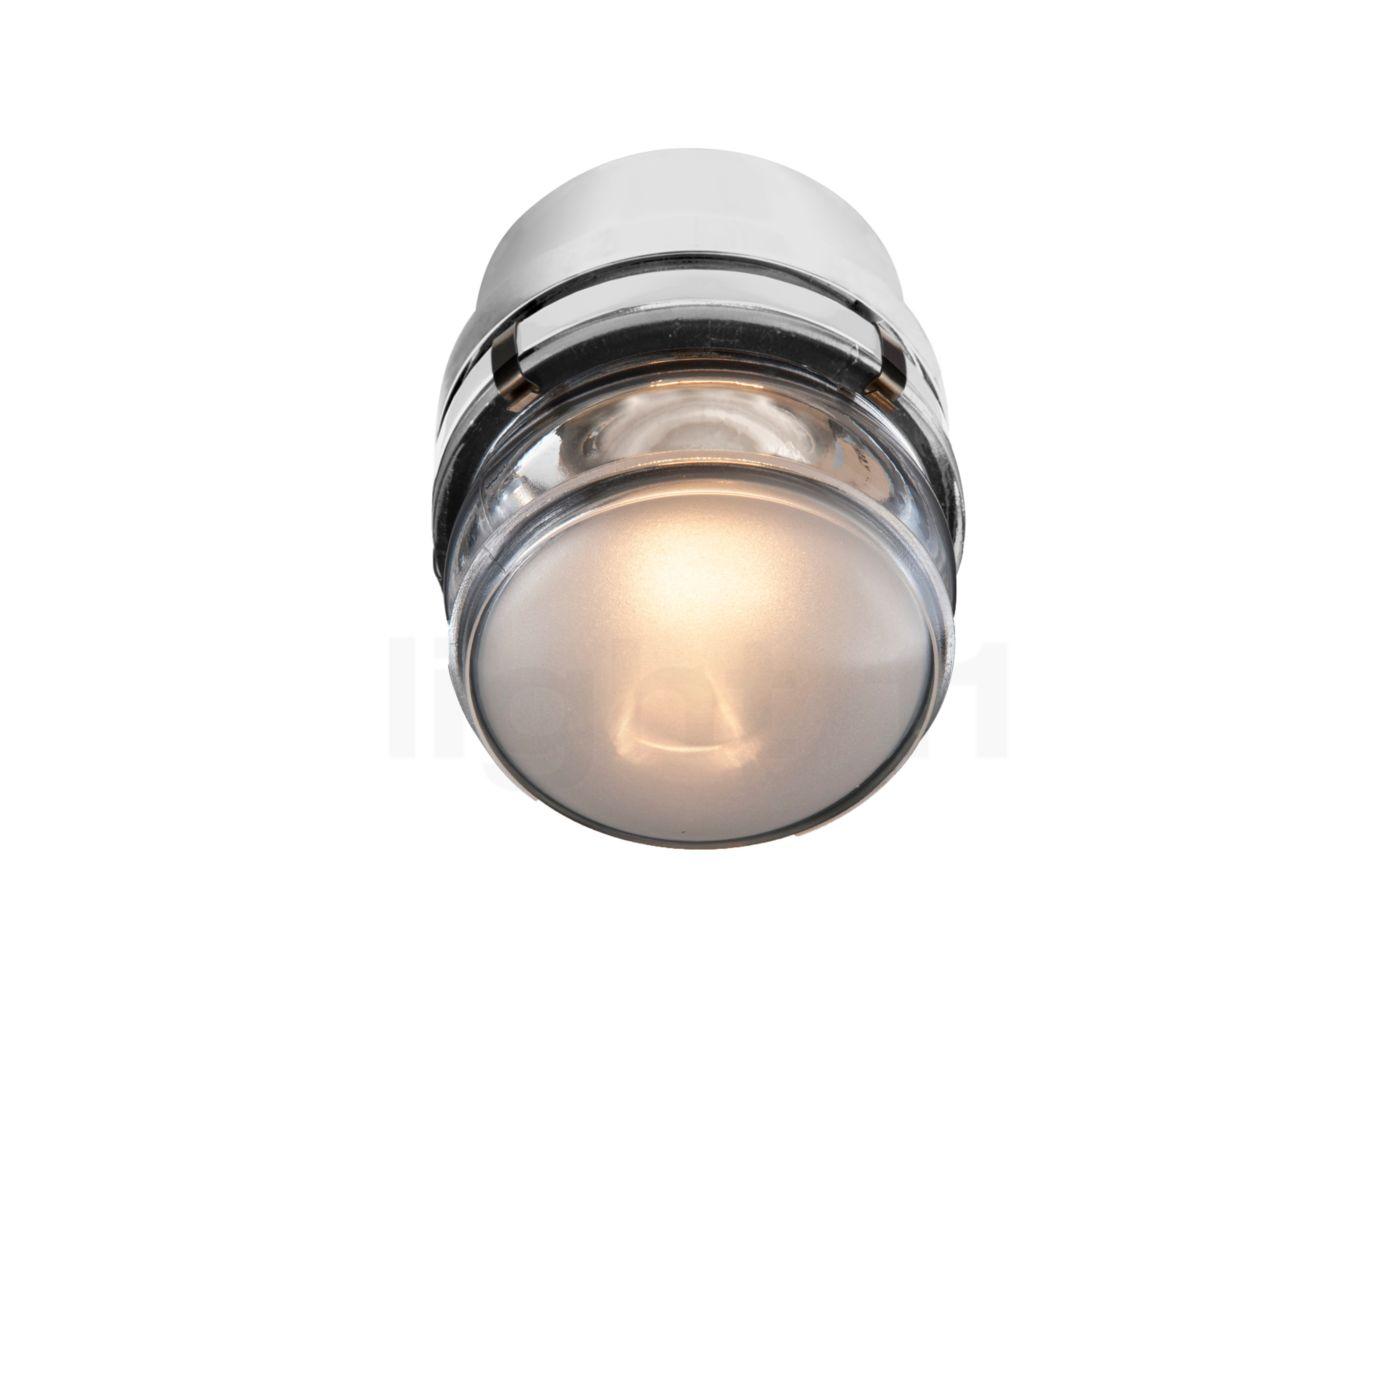 Oluce Fresnel Wandleuchte Outdoor LED, weiß L1148/LBT BI